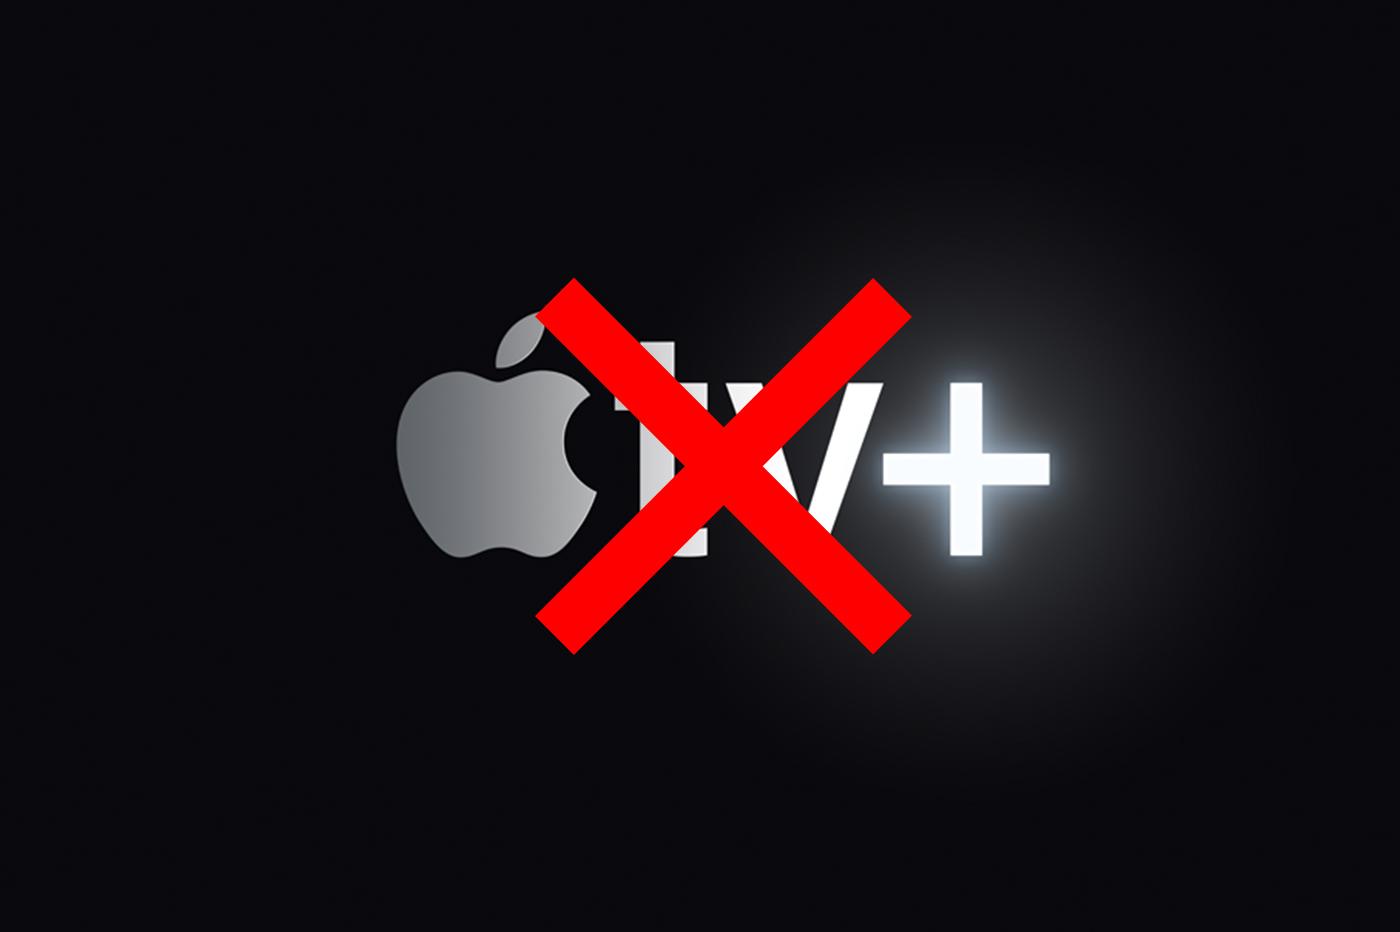 Chine Apple